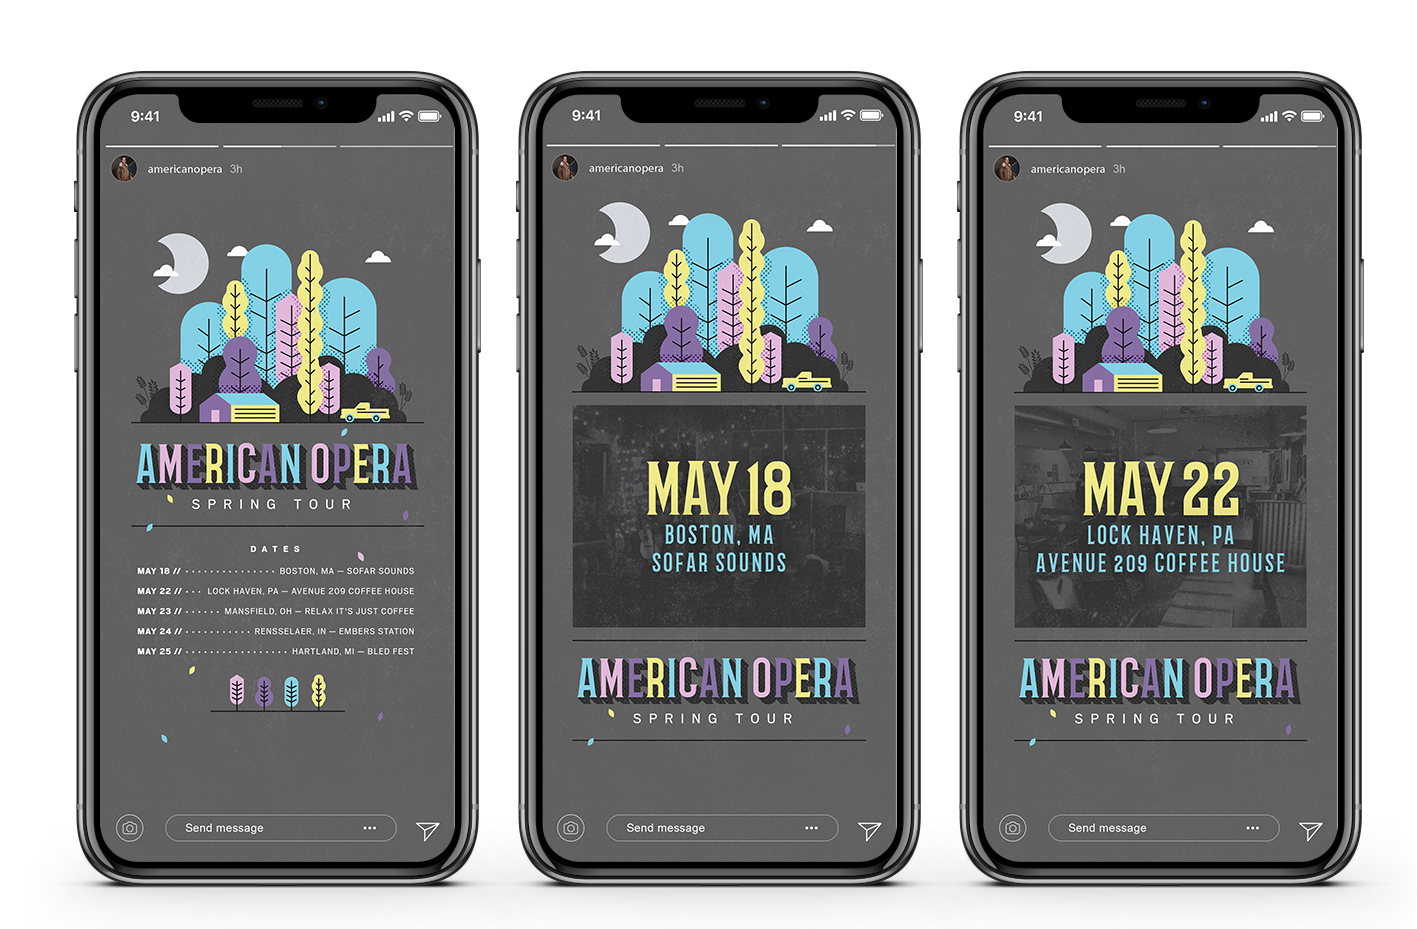 American-Opera_Mobile-Design-v1.png